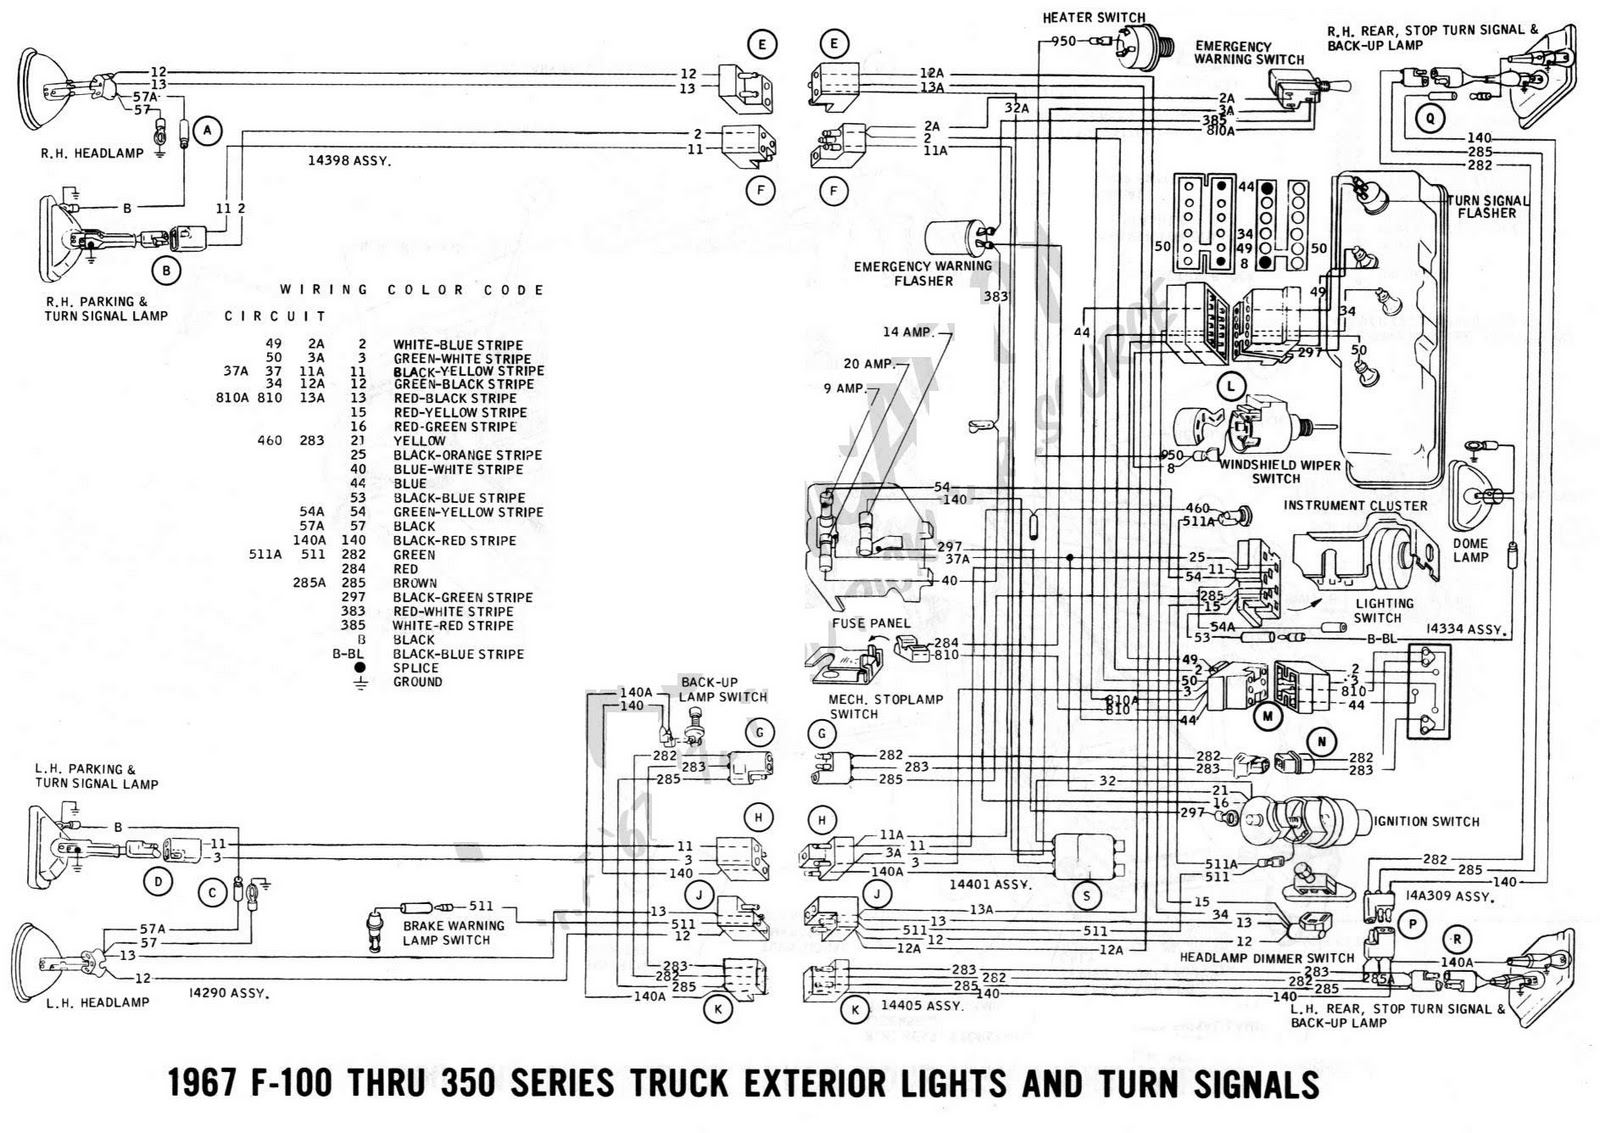 turn signal wiring diagrams 1997 club car diagram 36 volt 1969 chevy truck get free